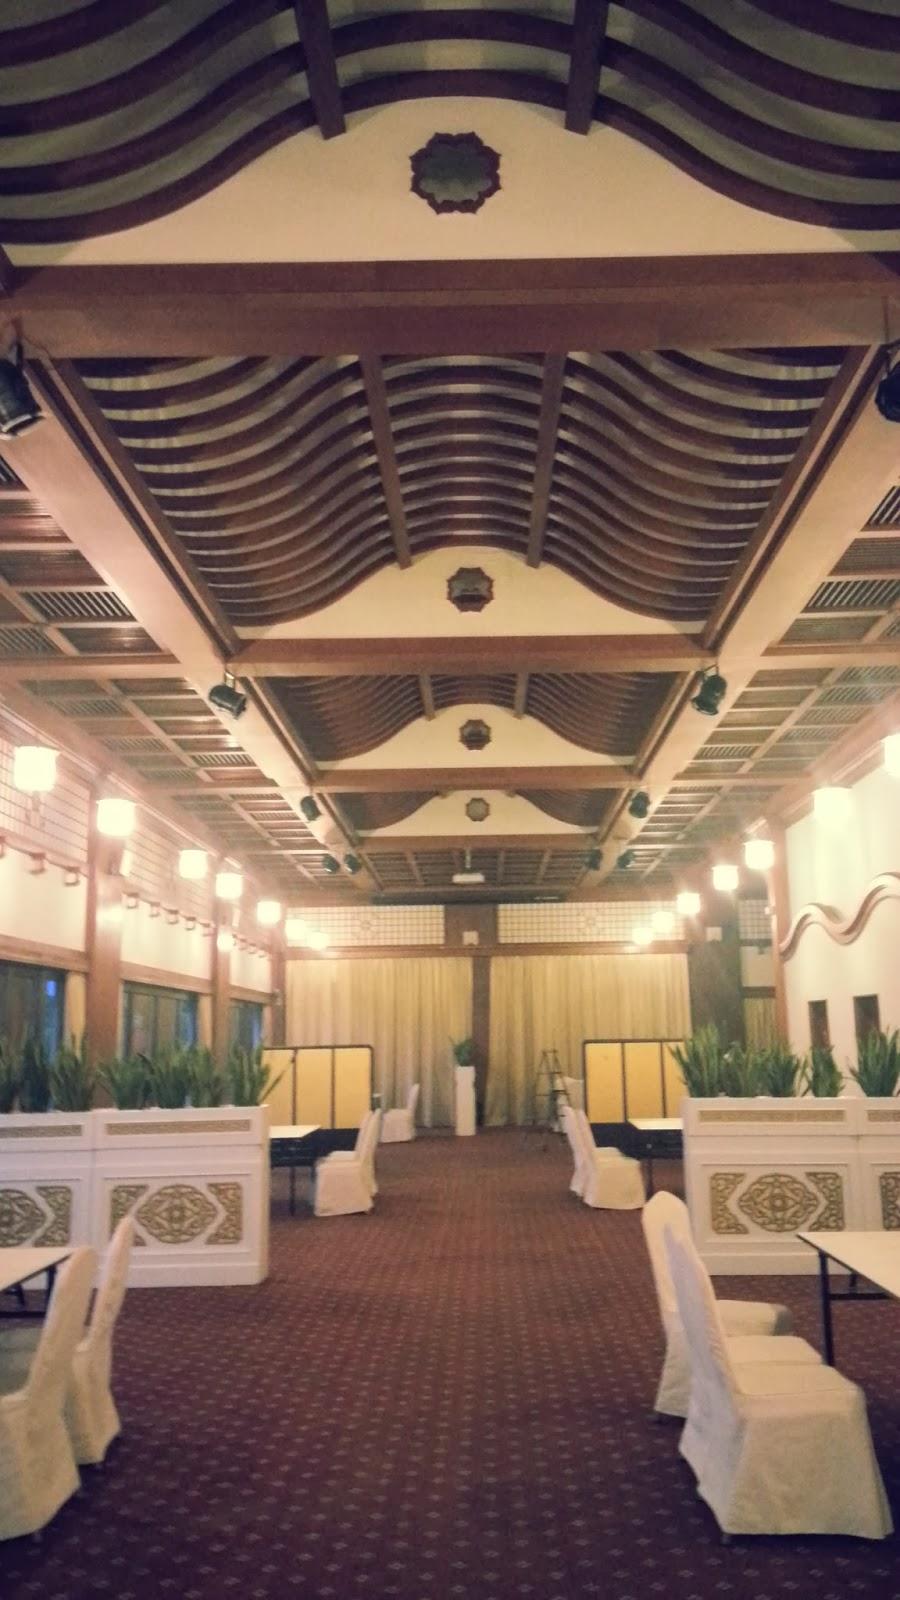 FAiaNdtHeCitY: 【臺北 2013 Day 04】※圓山飯店